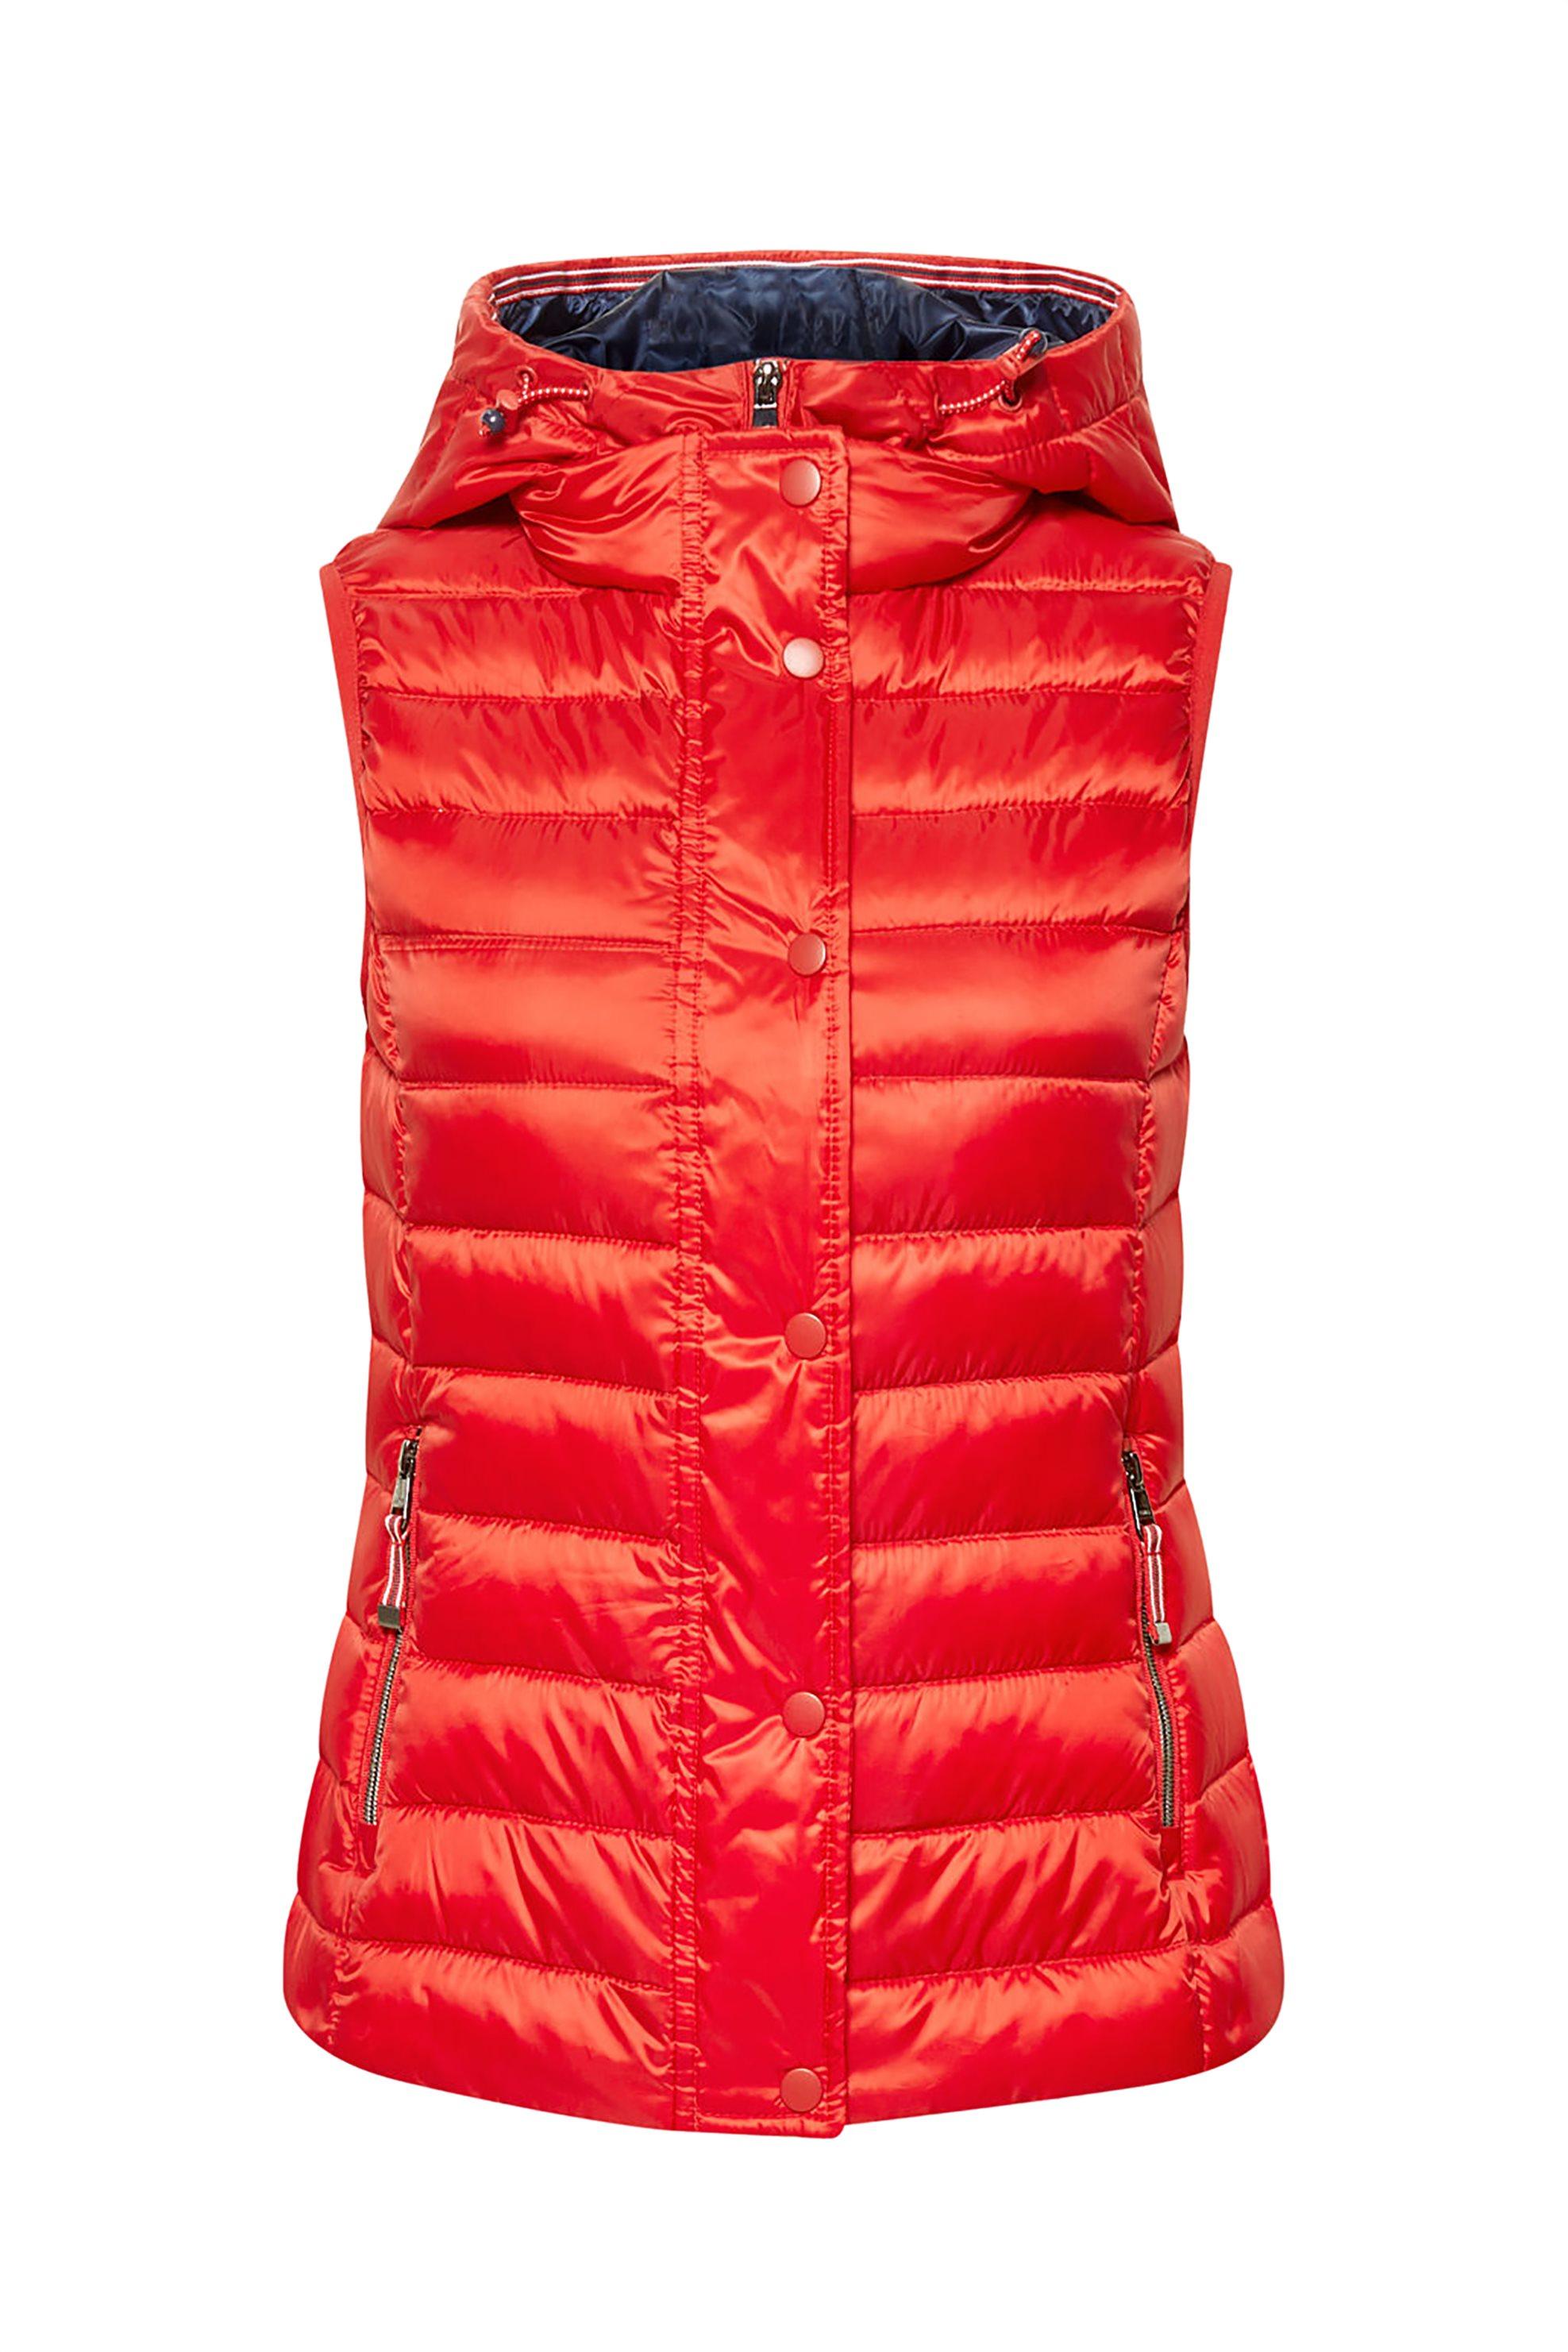 Esprit γυναικείο αμάνικο καπιτονέ μπουφάν με κουκούλα - 019EE1H001 - Κόκκινο γυναικα   ρουχα   πανωφόρια   μπουφάν   σακάκια   αμάνικα μπουφάν